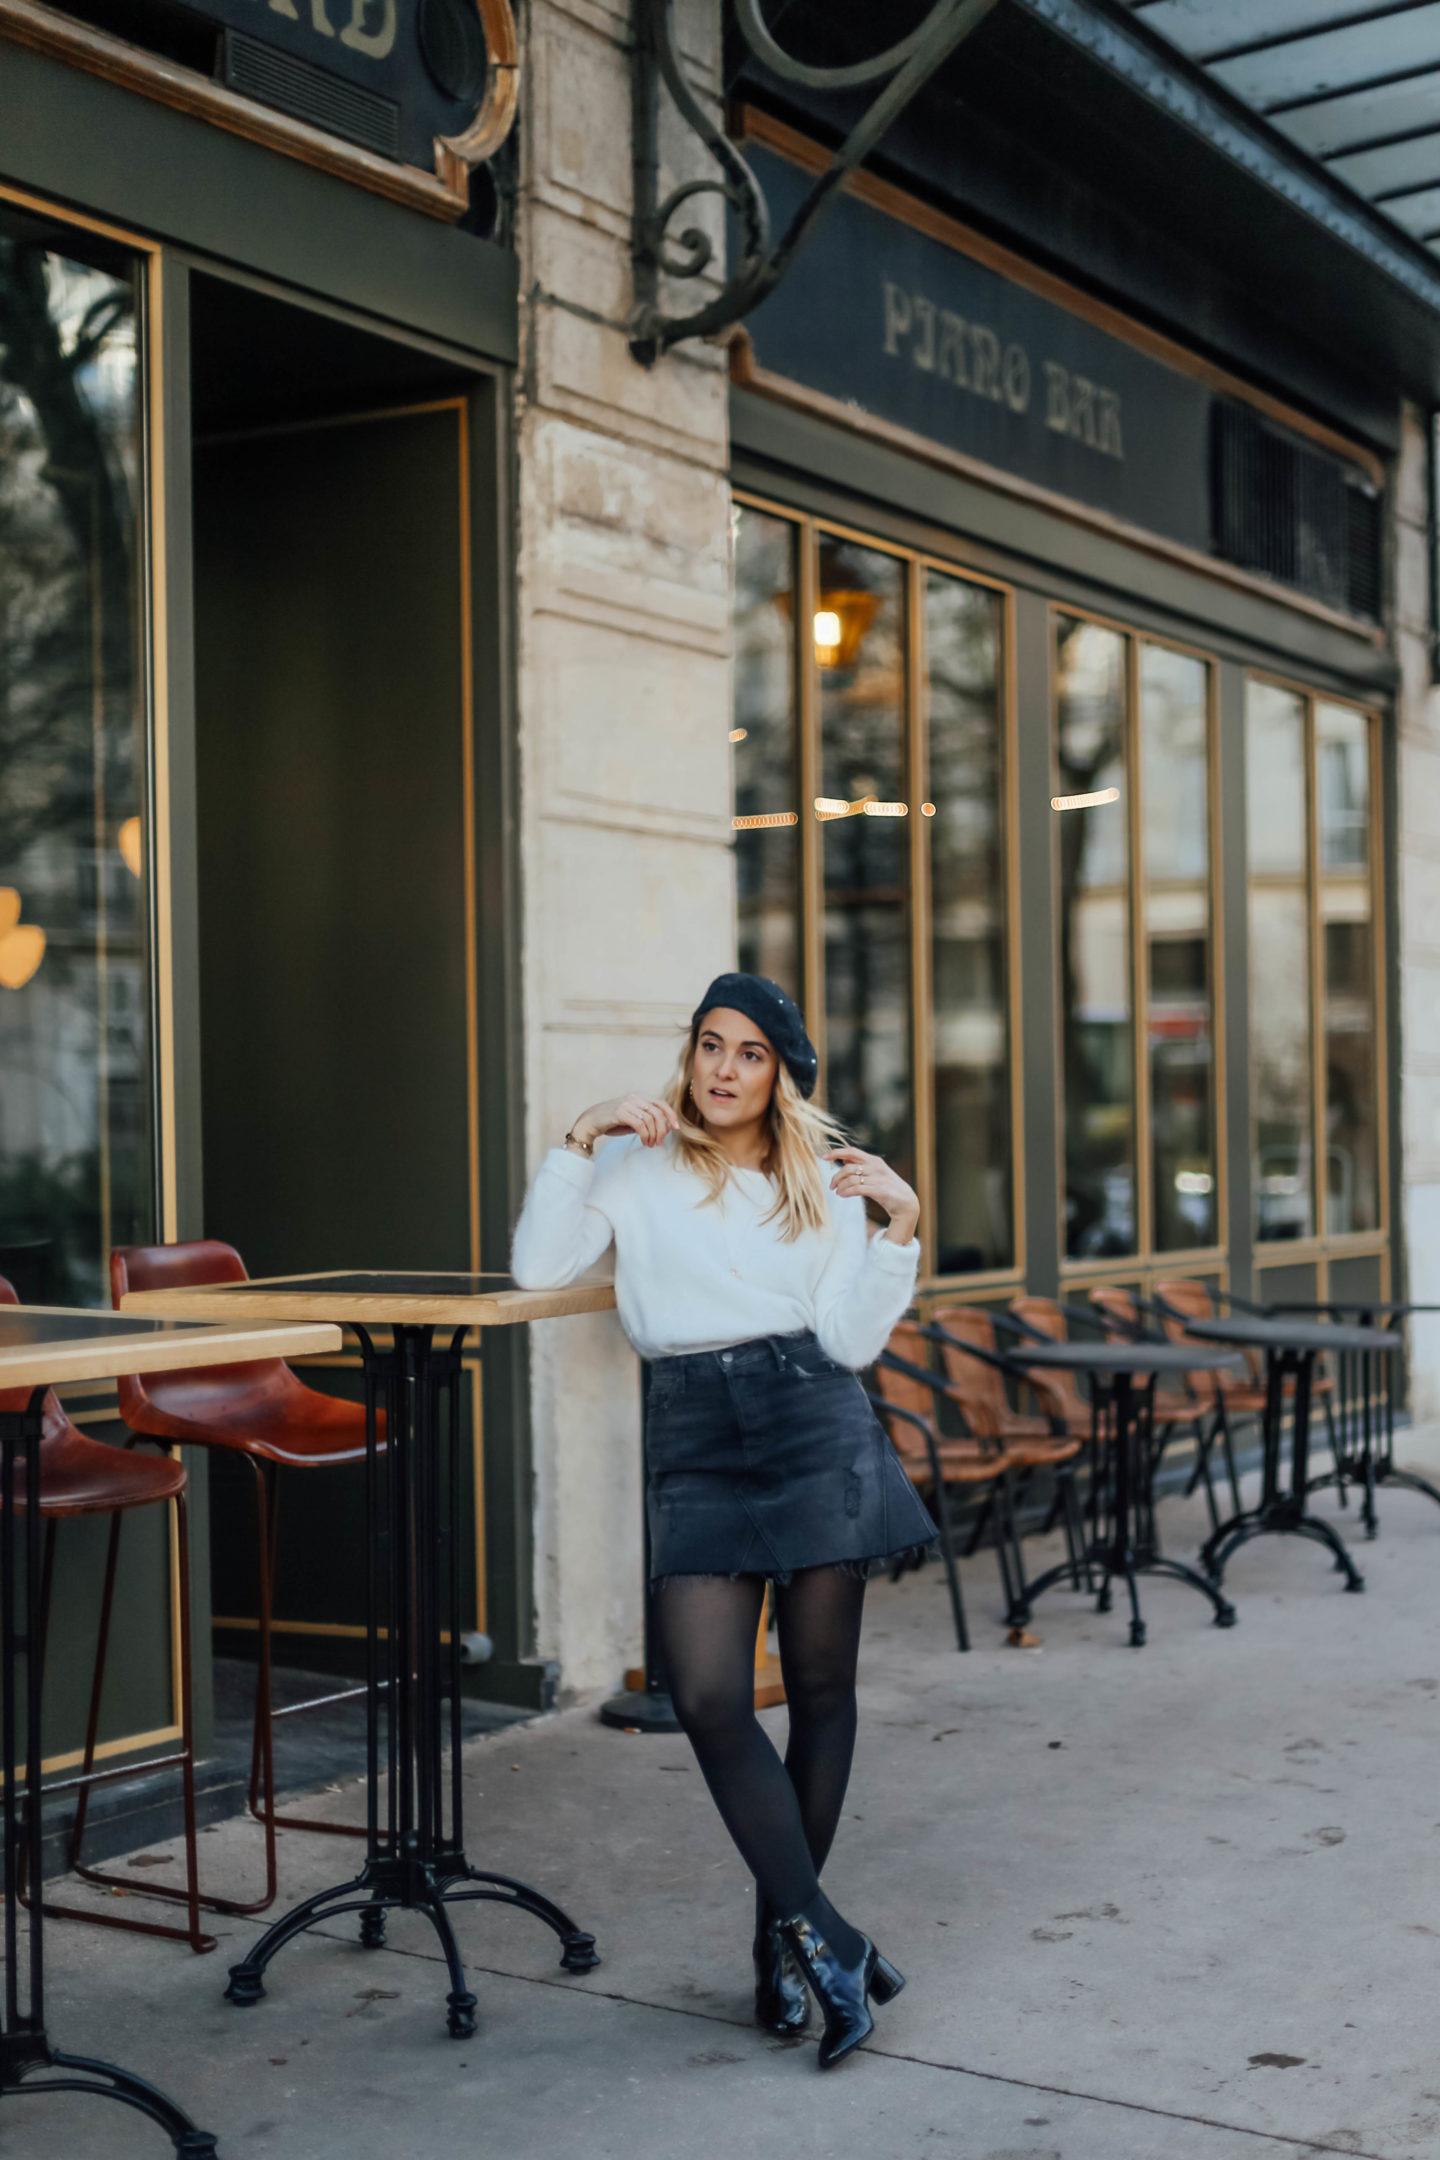 Style parisien - Blondie Baby blog mode et voyages